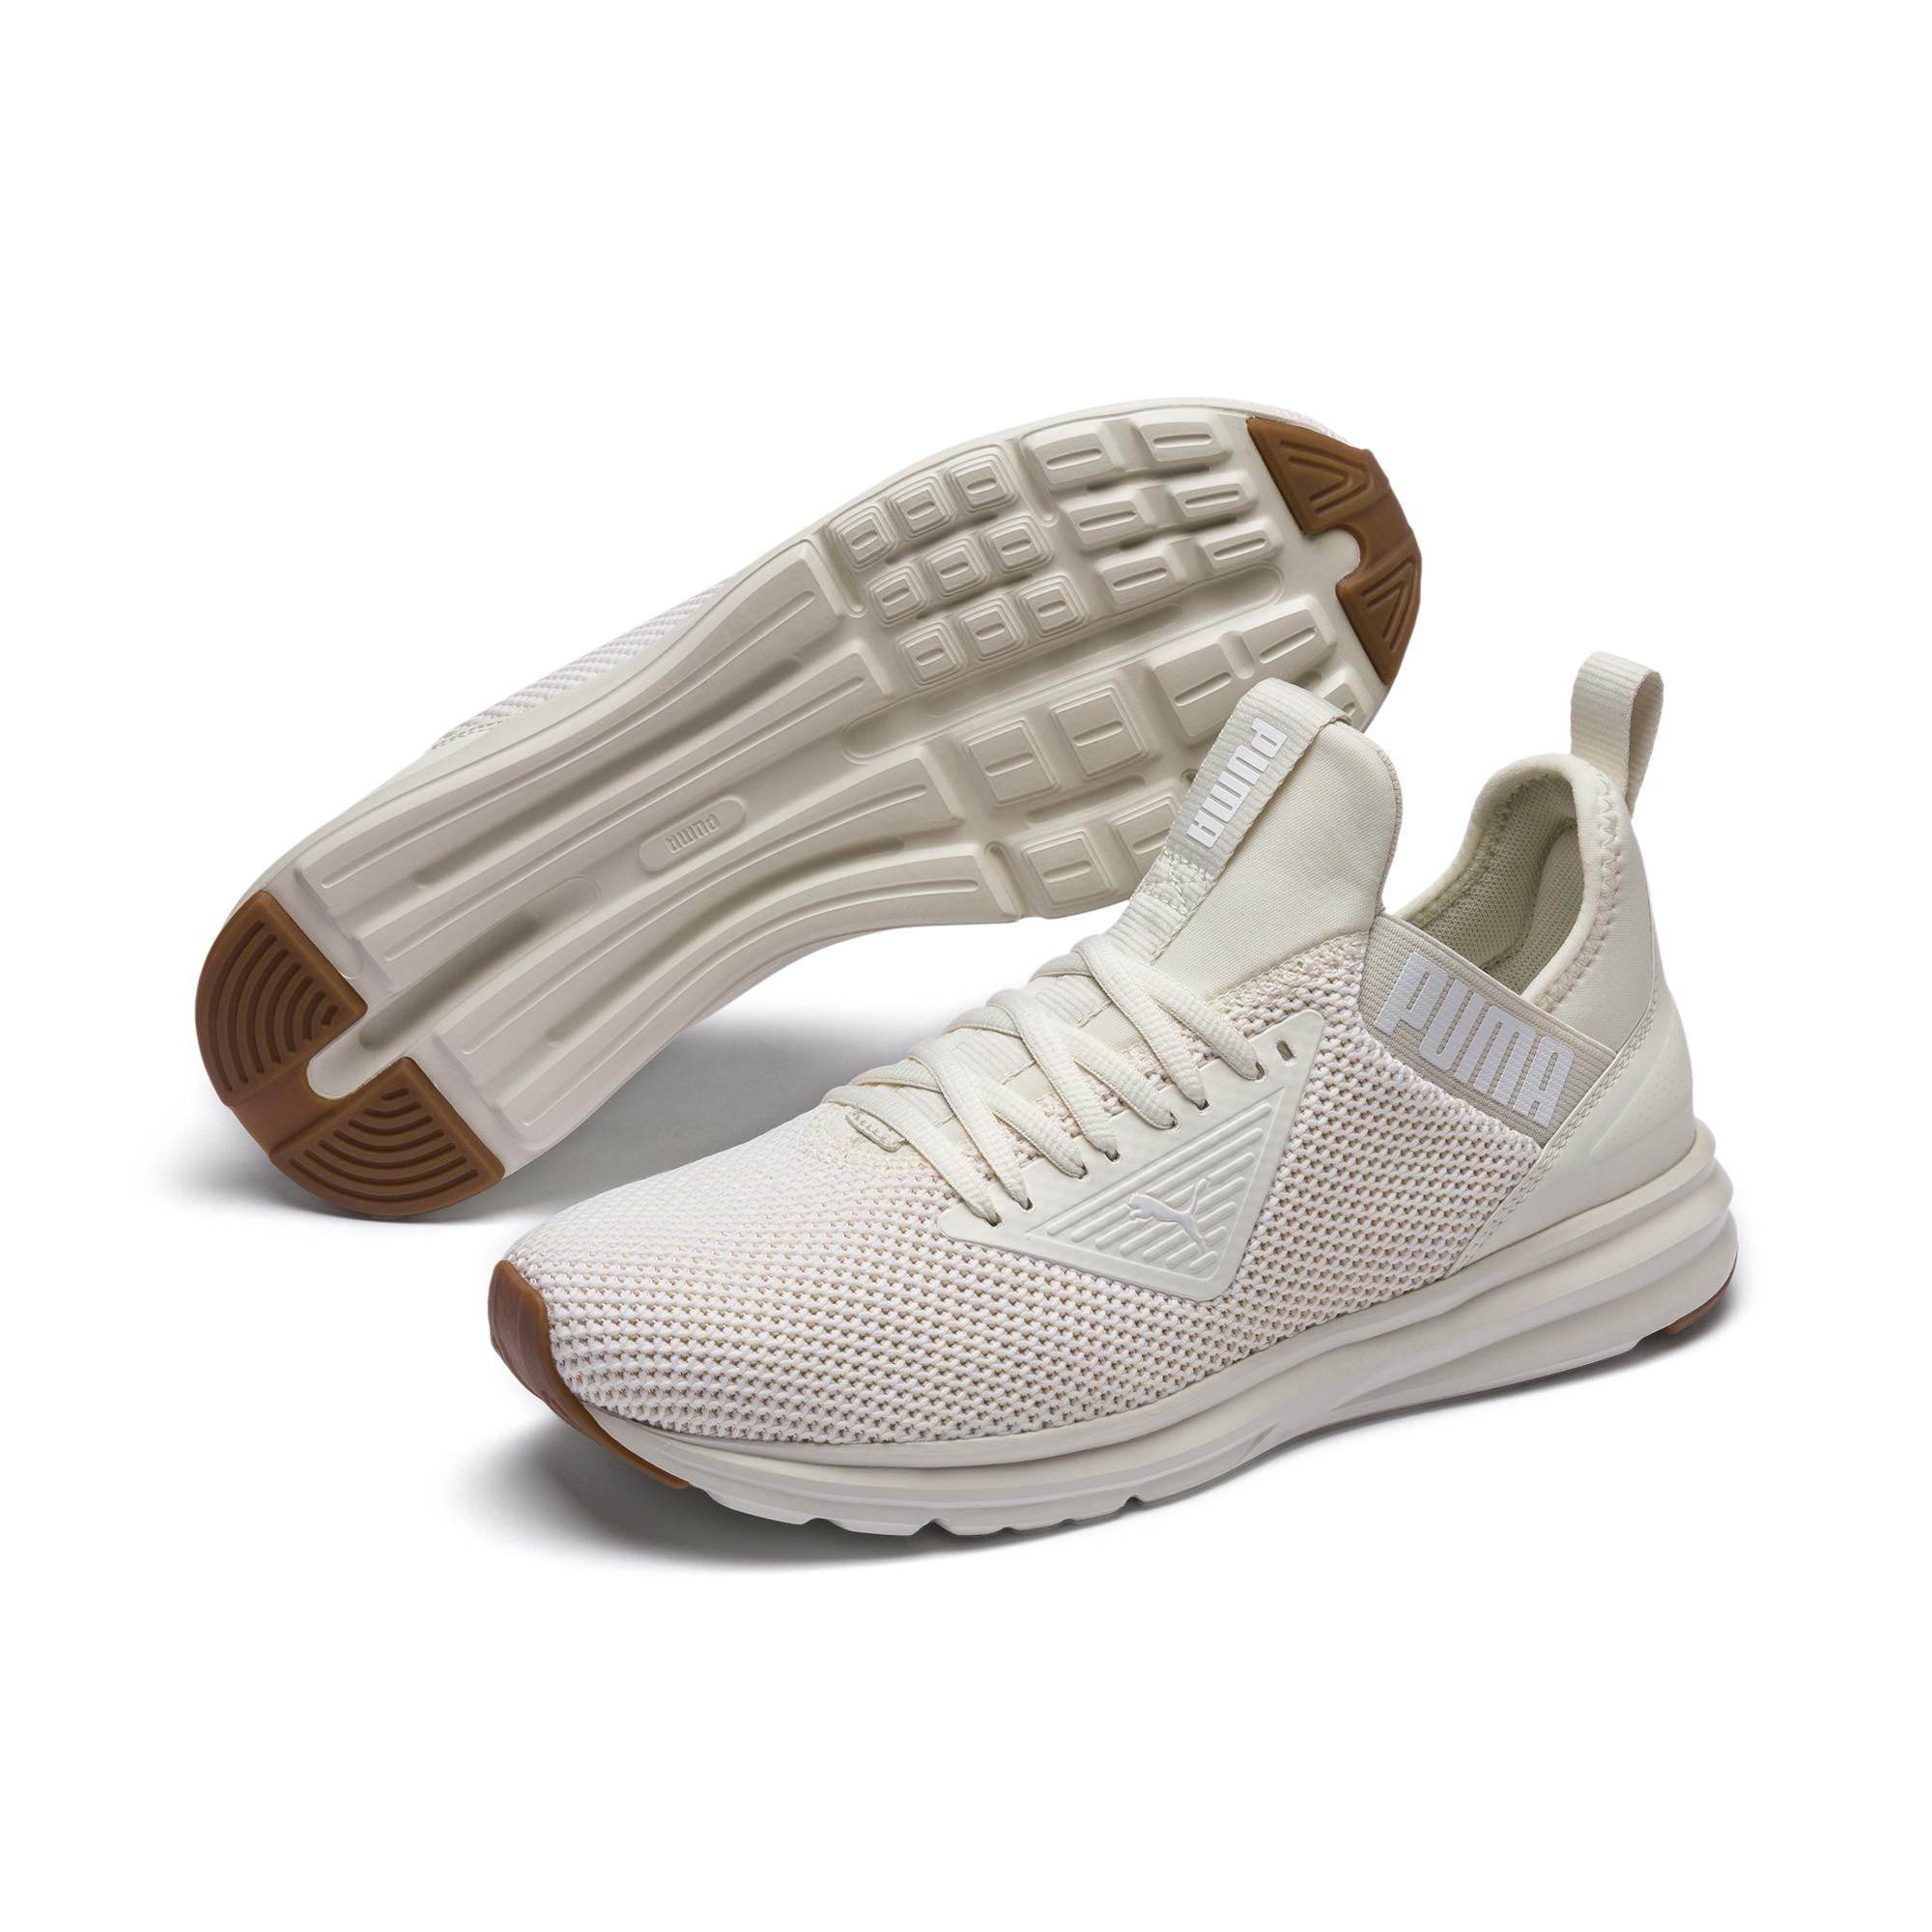 PUMA - White Enzo Beta Woven Men s Training Shoes for Men - Lyst. View  fullscreen a1d2b8e31